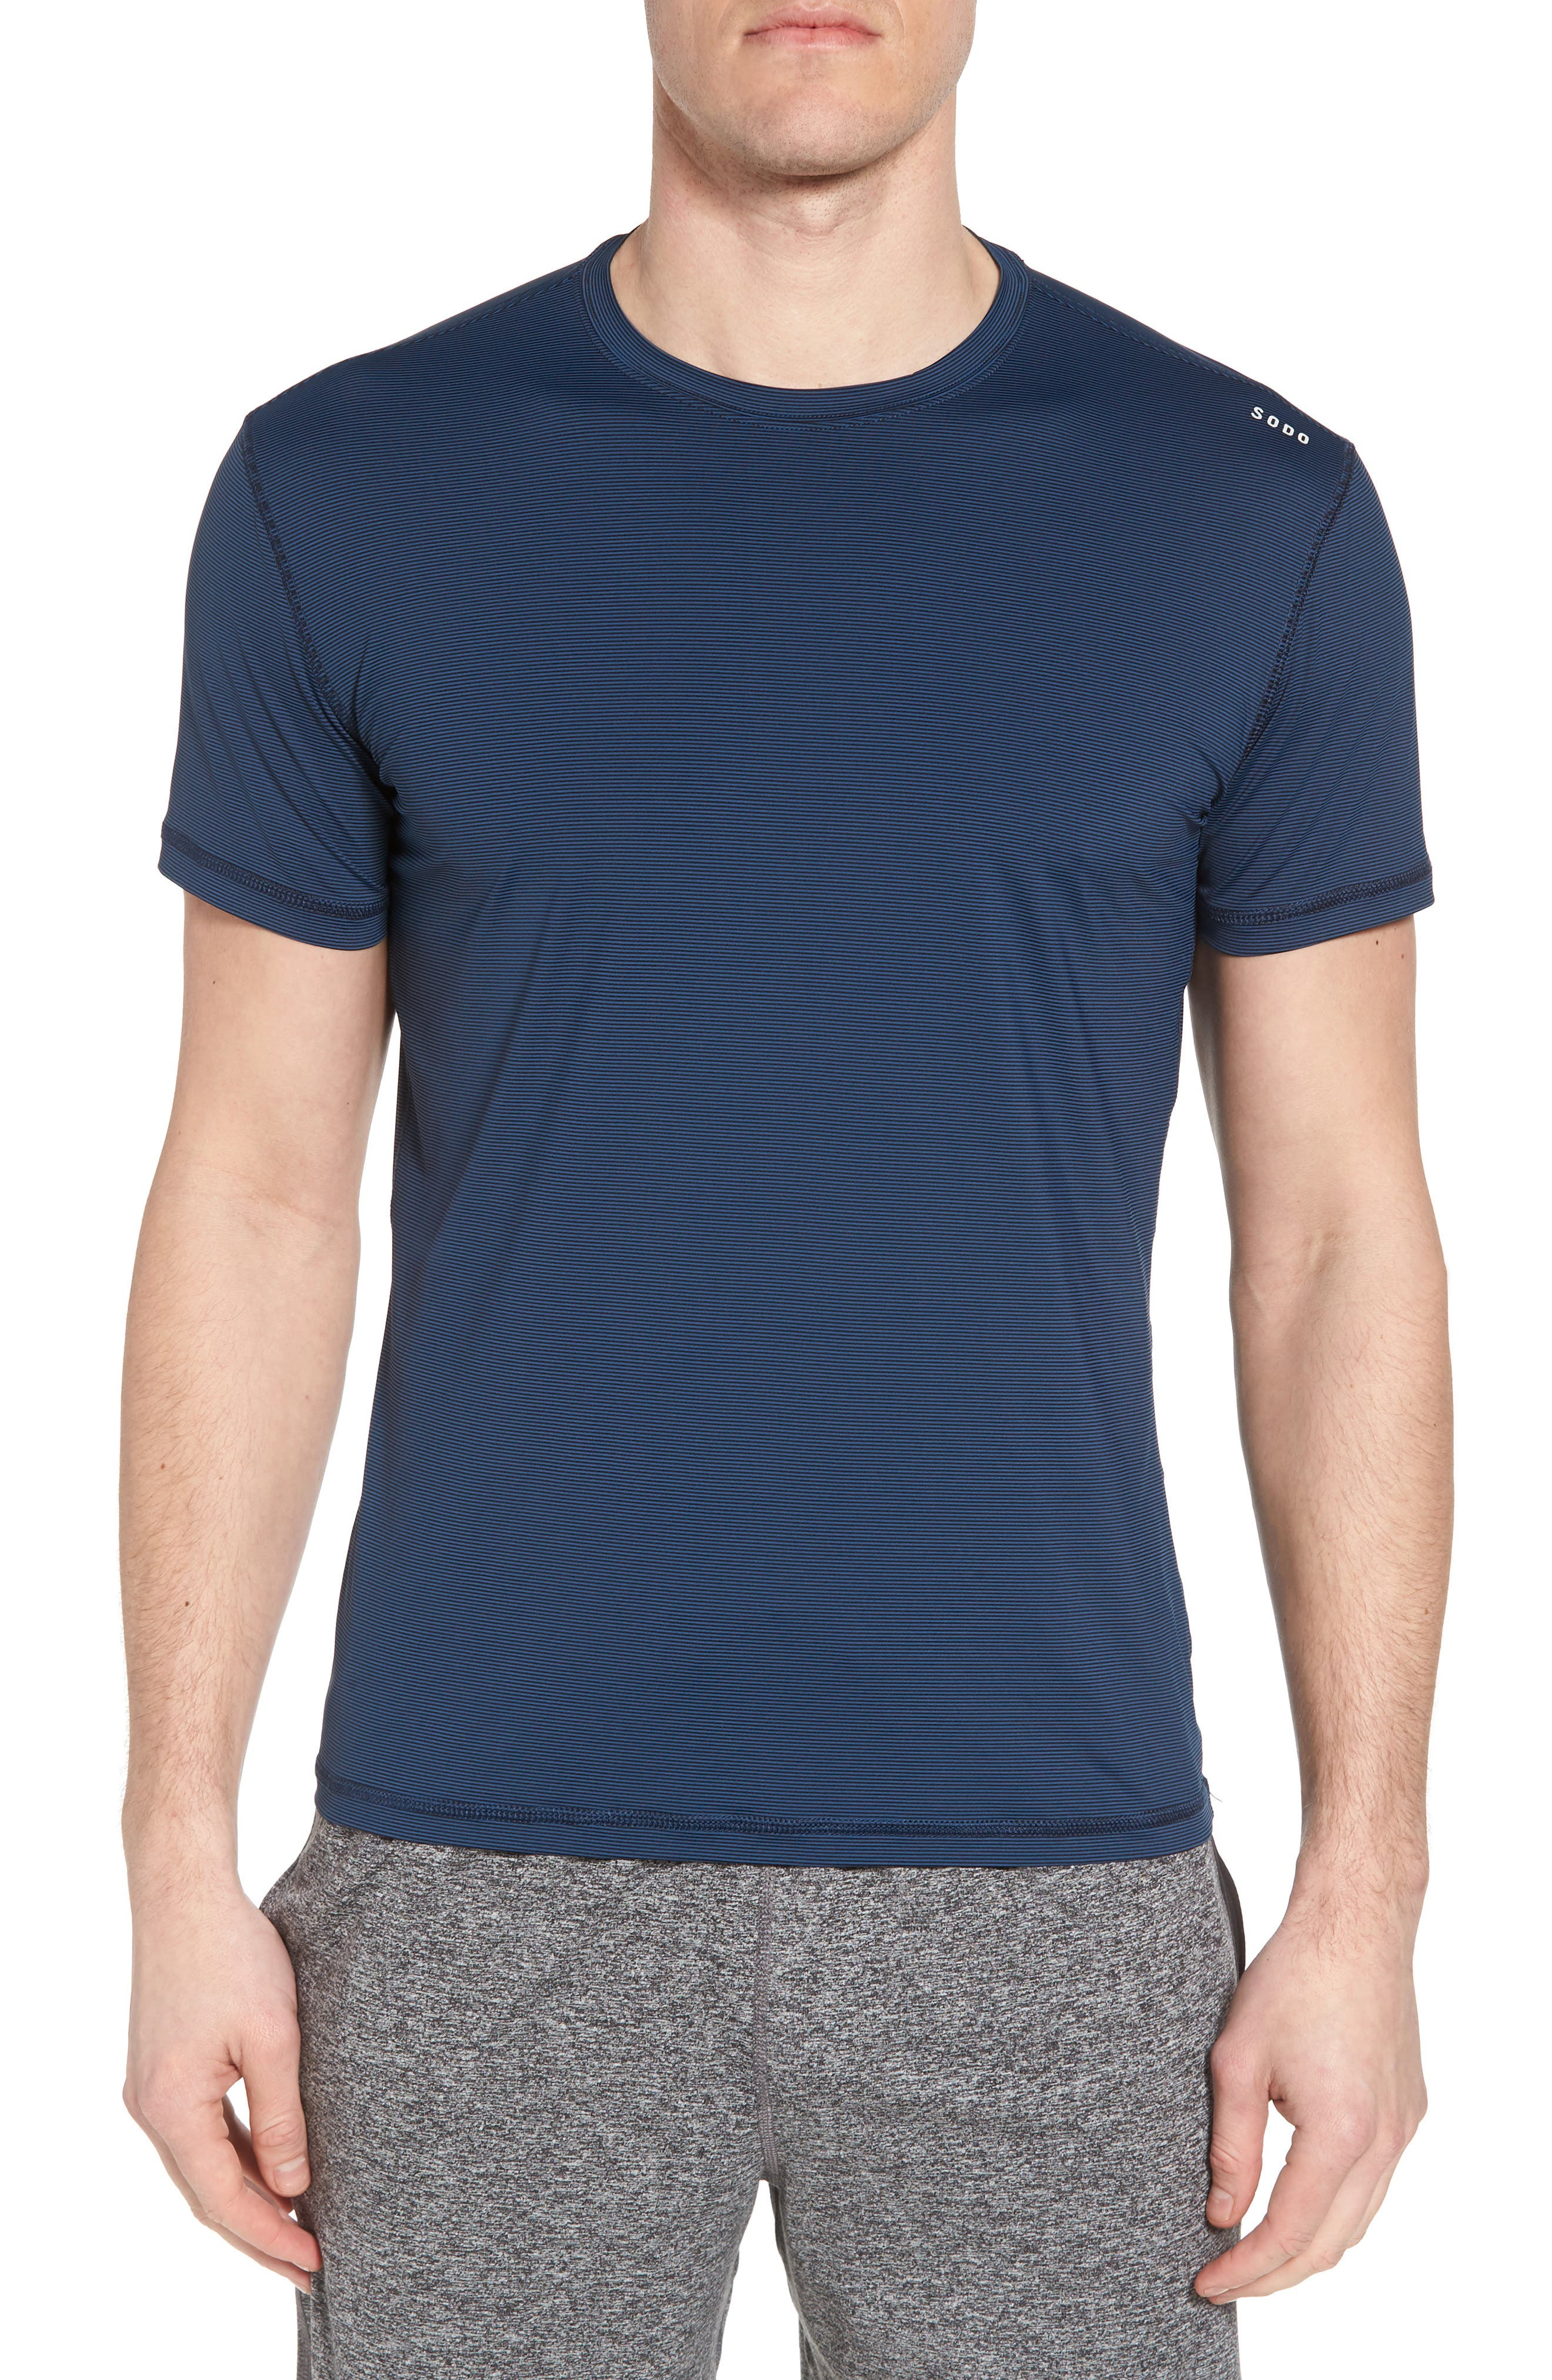 Sodo Lightweight Micro-Stripe Workout T-Shirt, Metallic